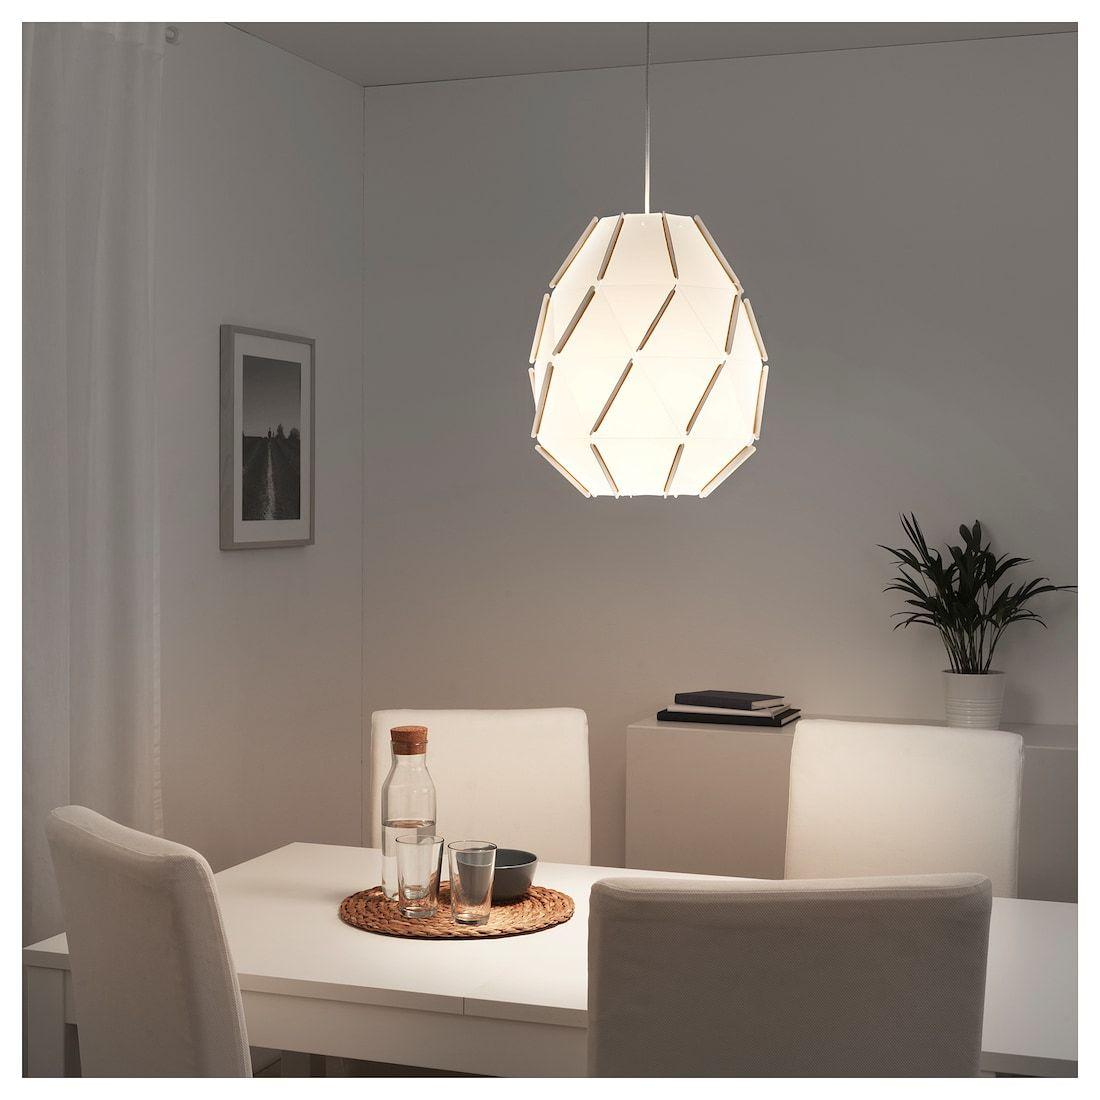 Us Furniture And Home Furnishings Pendant Lamp White Pendant